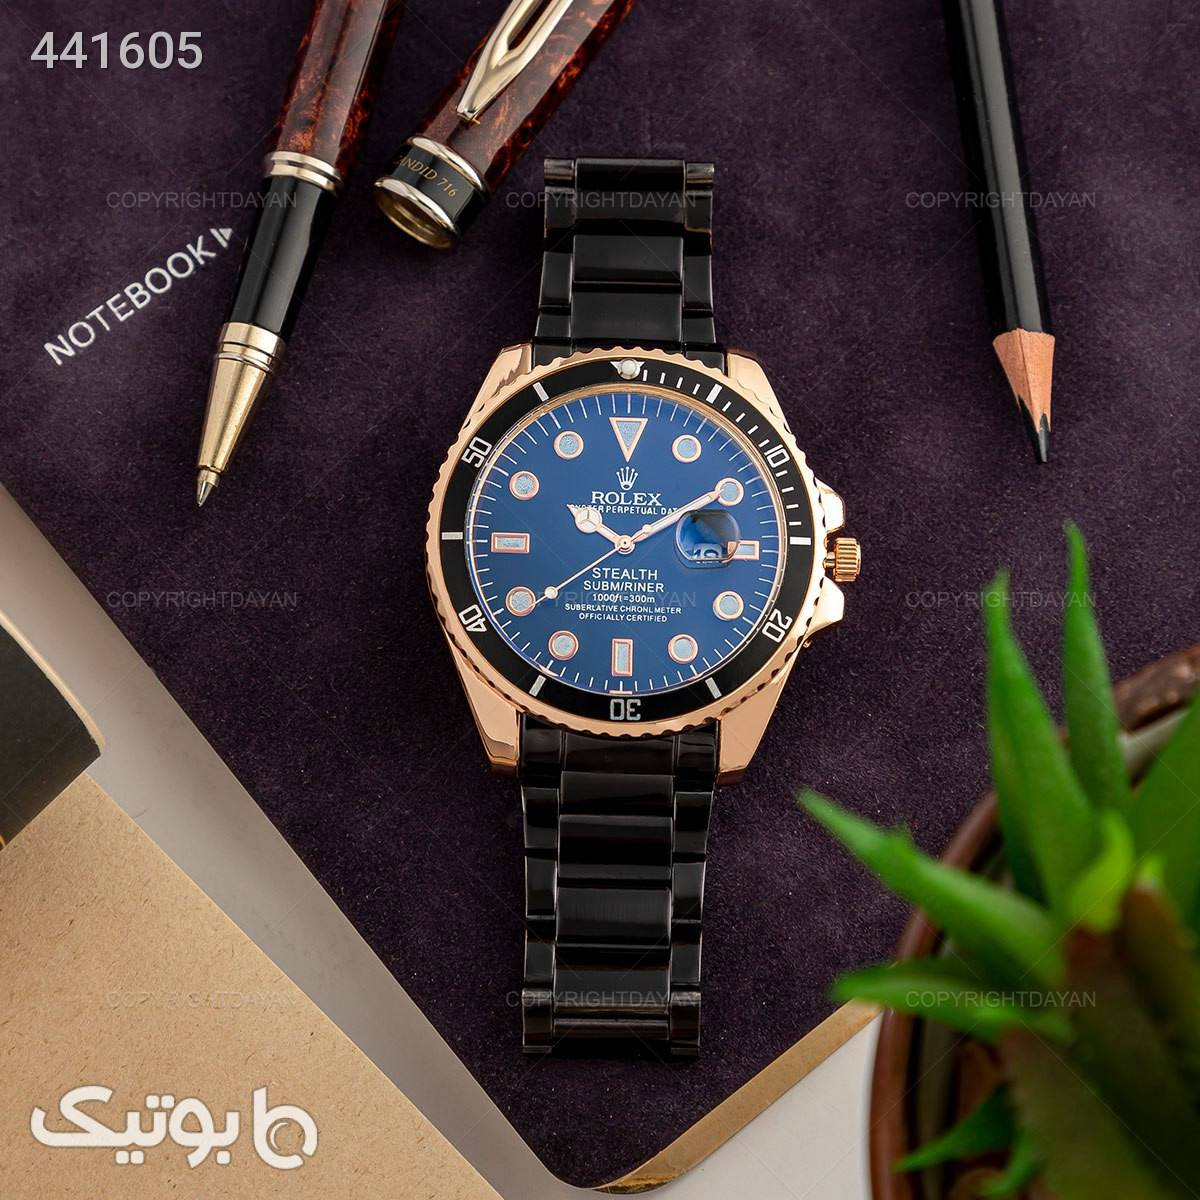 ساعت مچی مردانه Rolex مدل 13126 مشکی ساعت